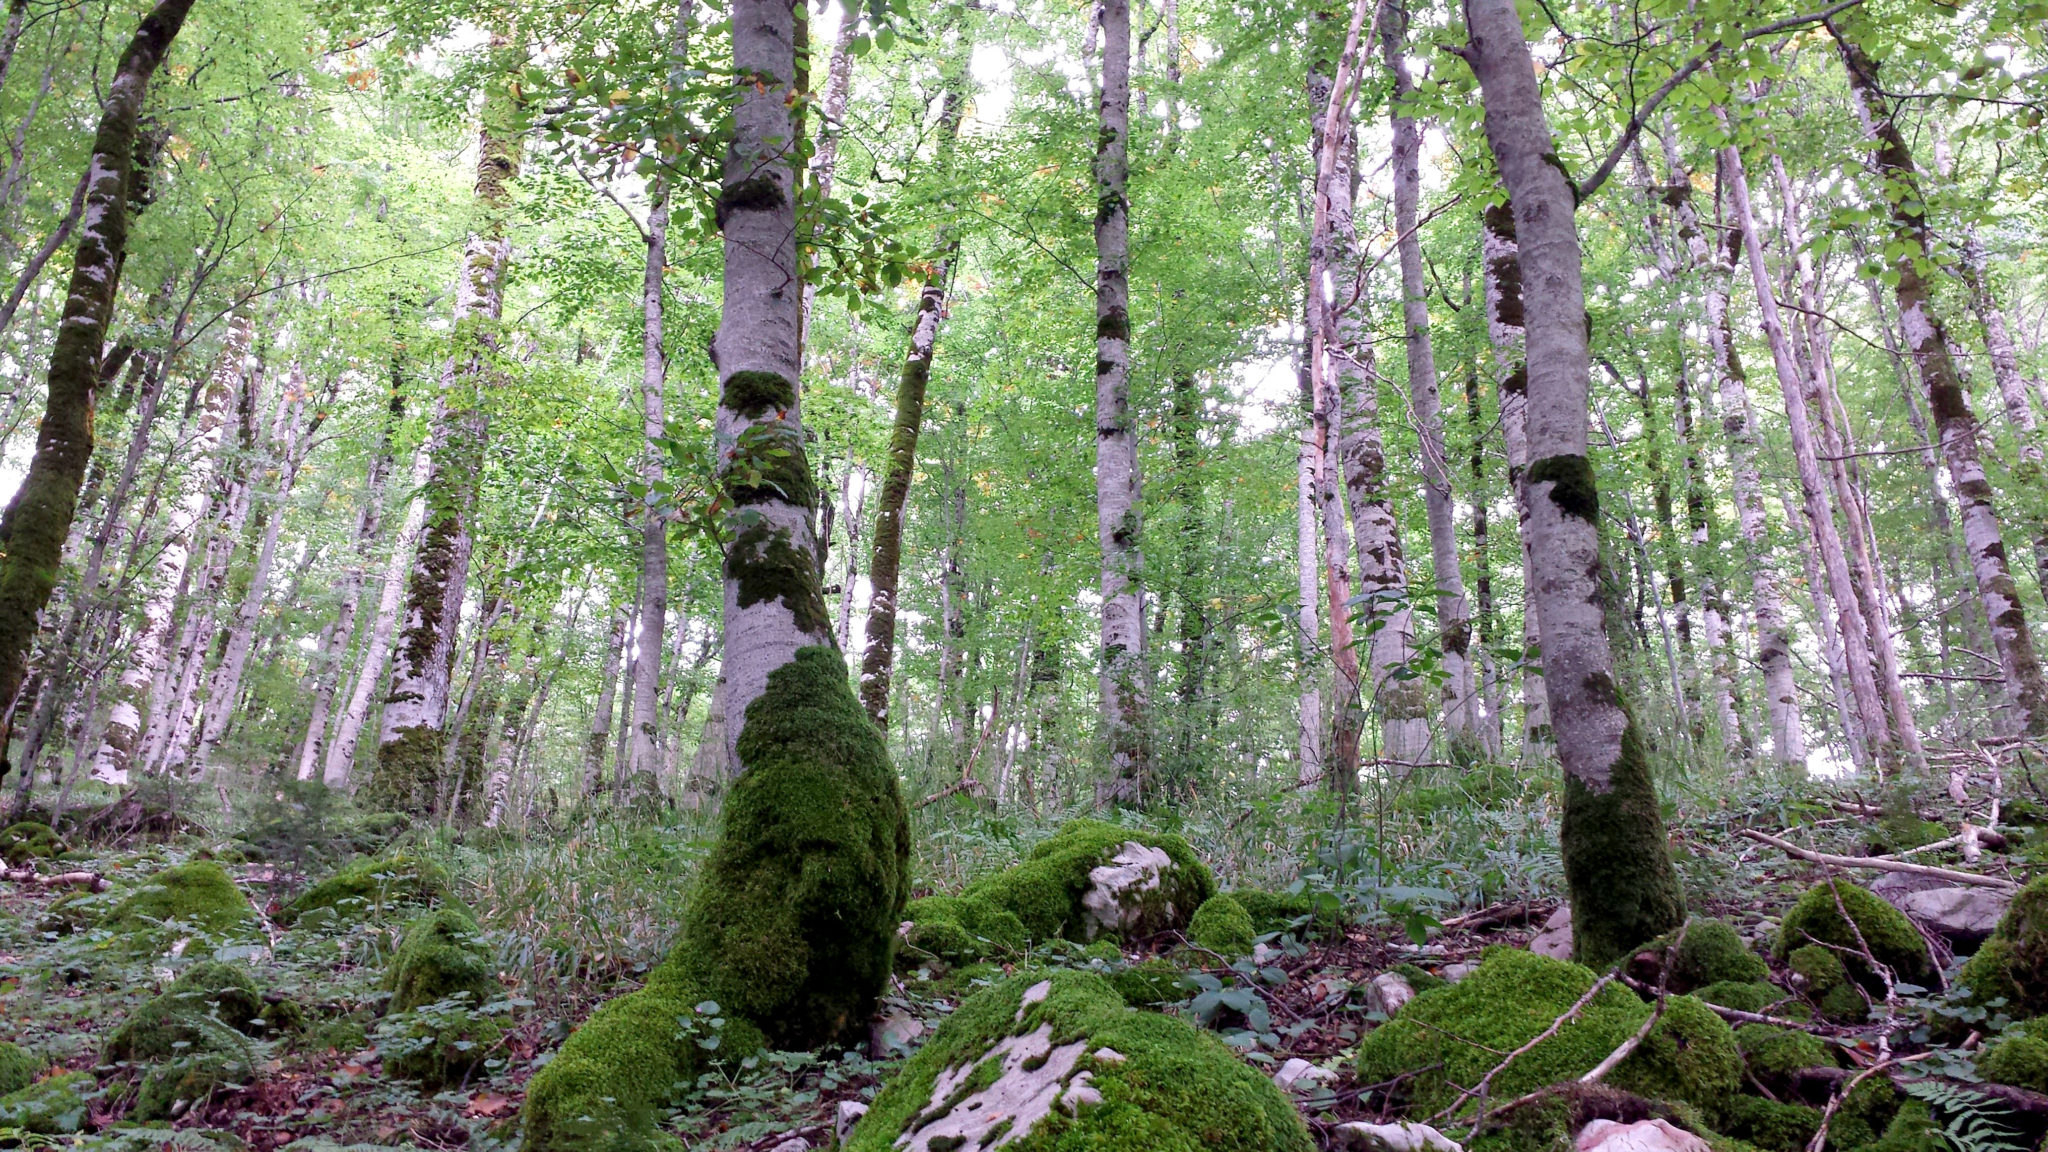 Hema_Montenegro_parc_national_biogradska_gora_forest_travel_voyage_blog4